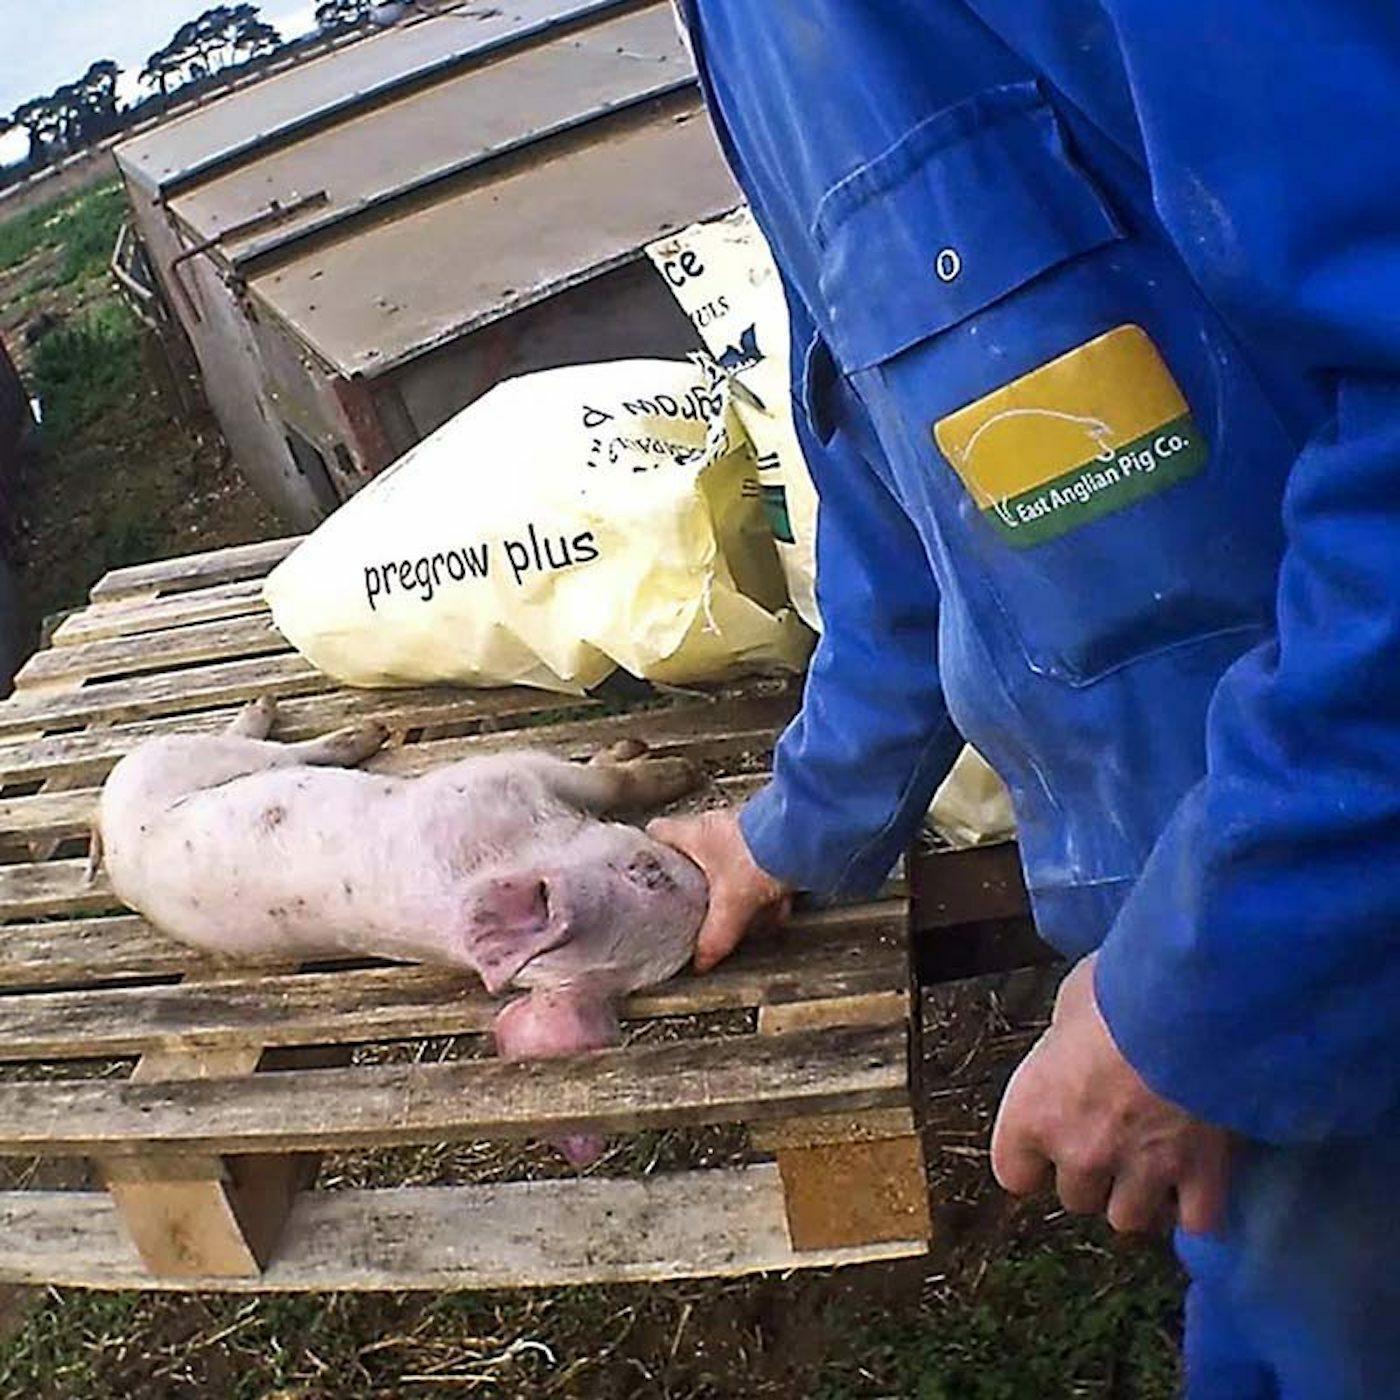 GRANJAS DE EAST ANGLIAN PIG COMPANY